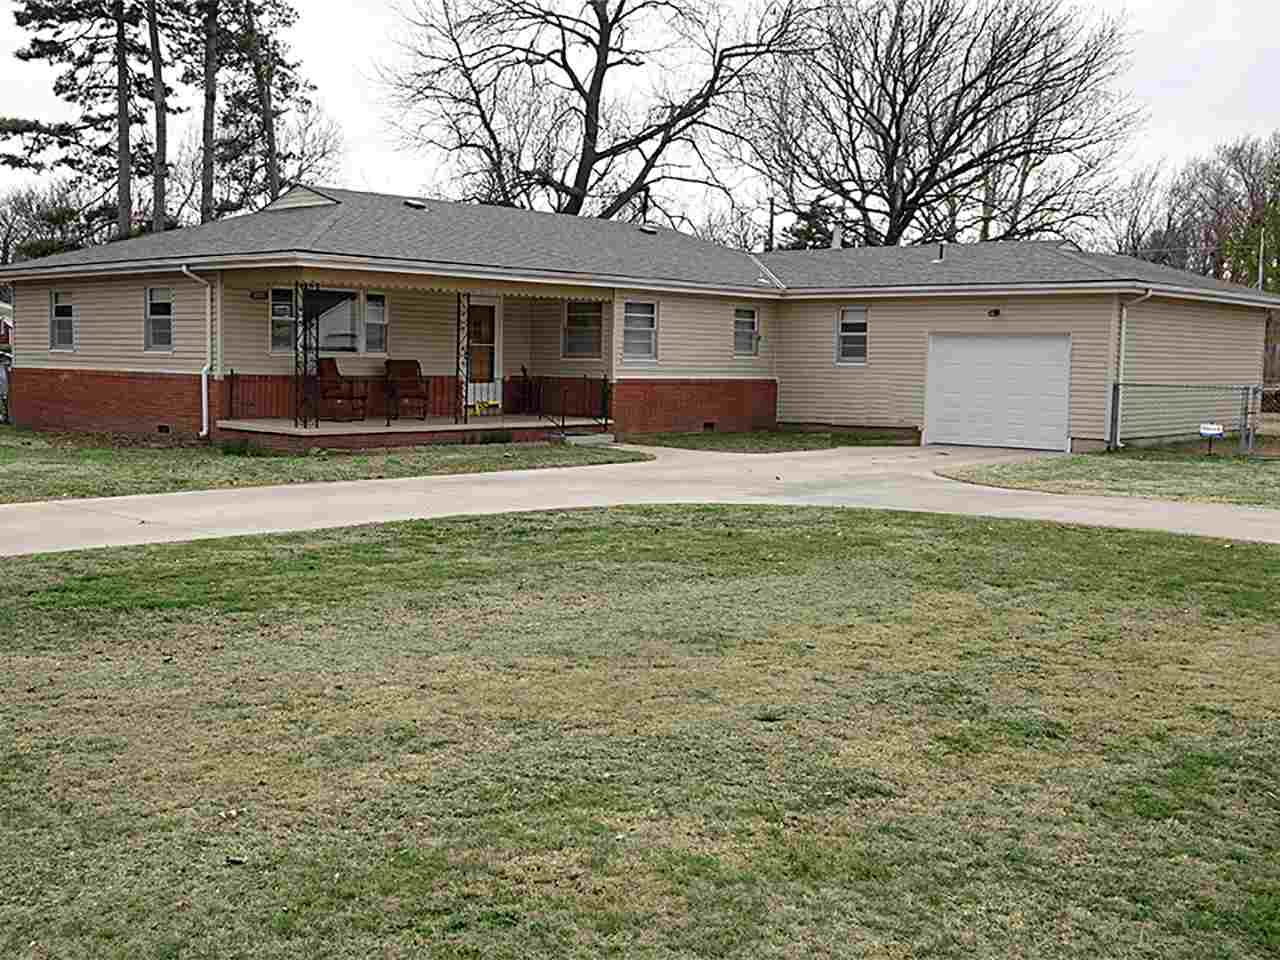 1555 N Pleasantview Dr, Wichita, KS 67203